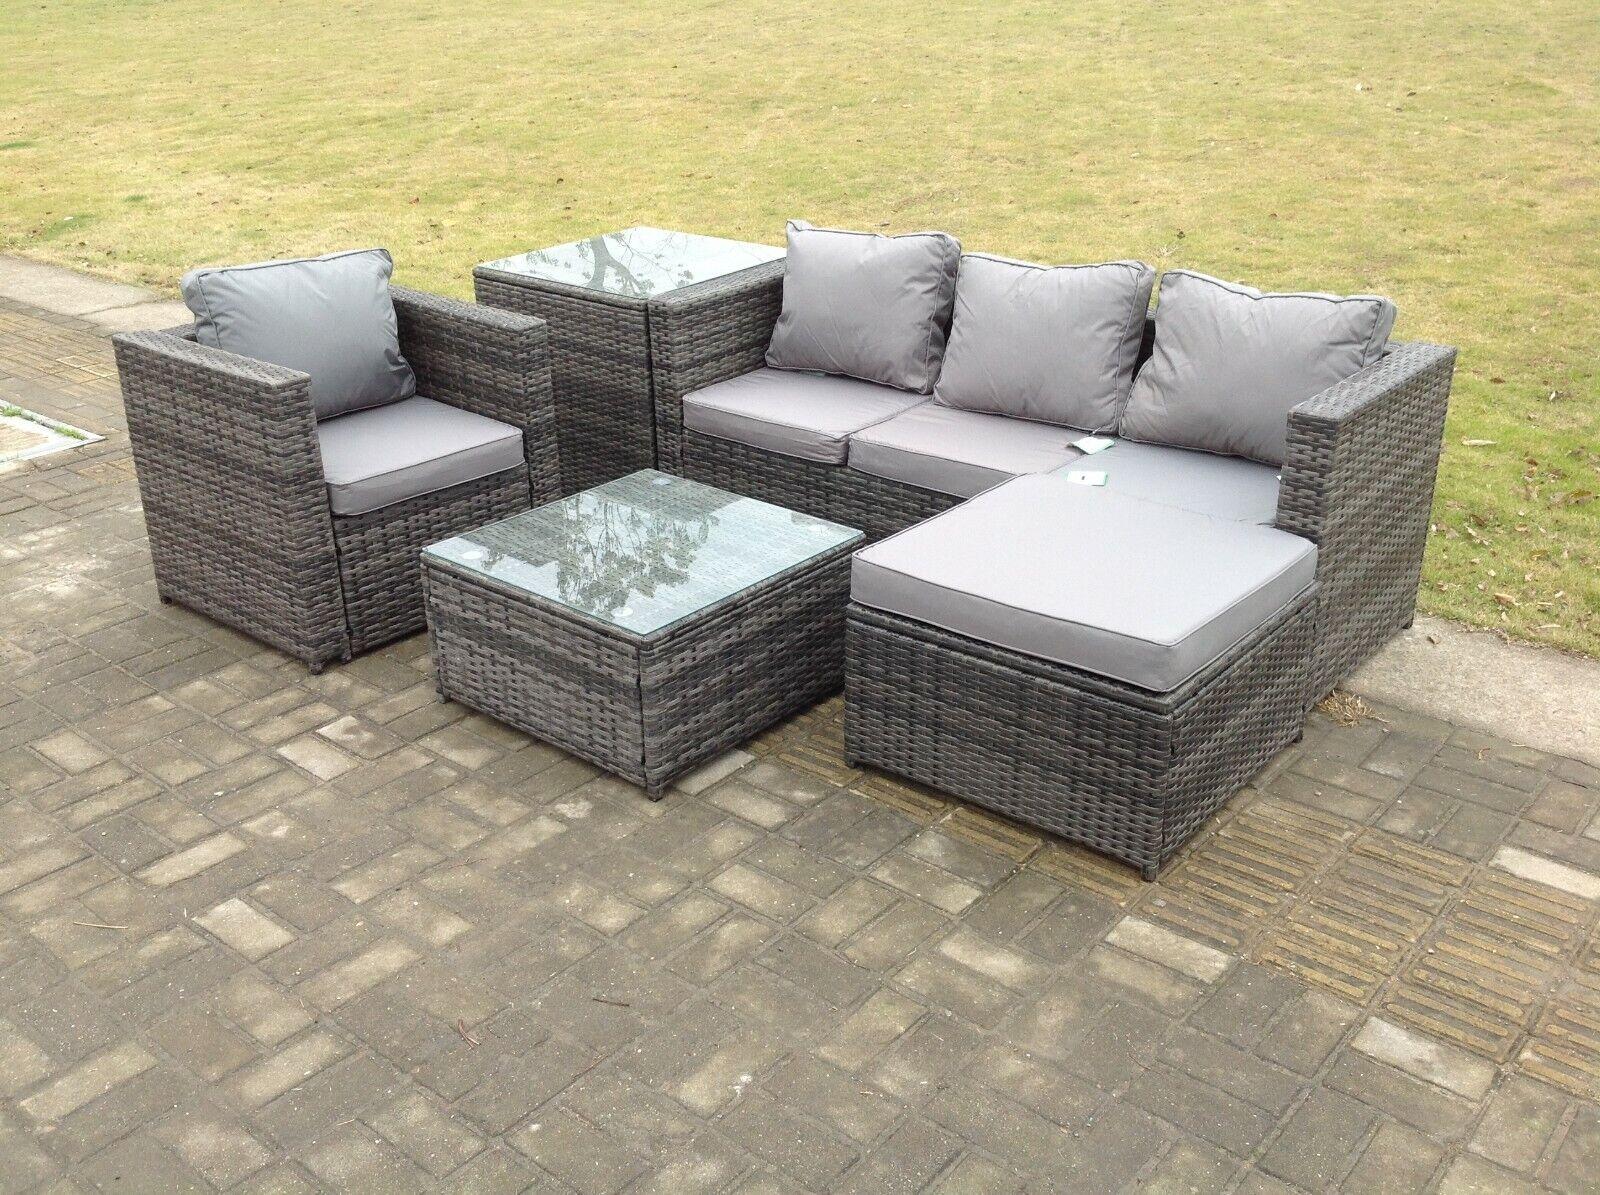 Garden Furniture - Lounge rattan sofa set with 2 table stool outdoor garden furniture patio grey